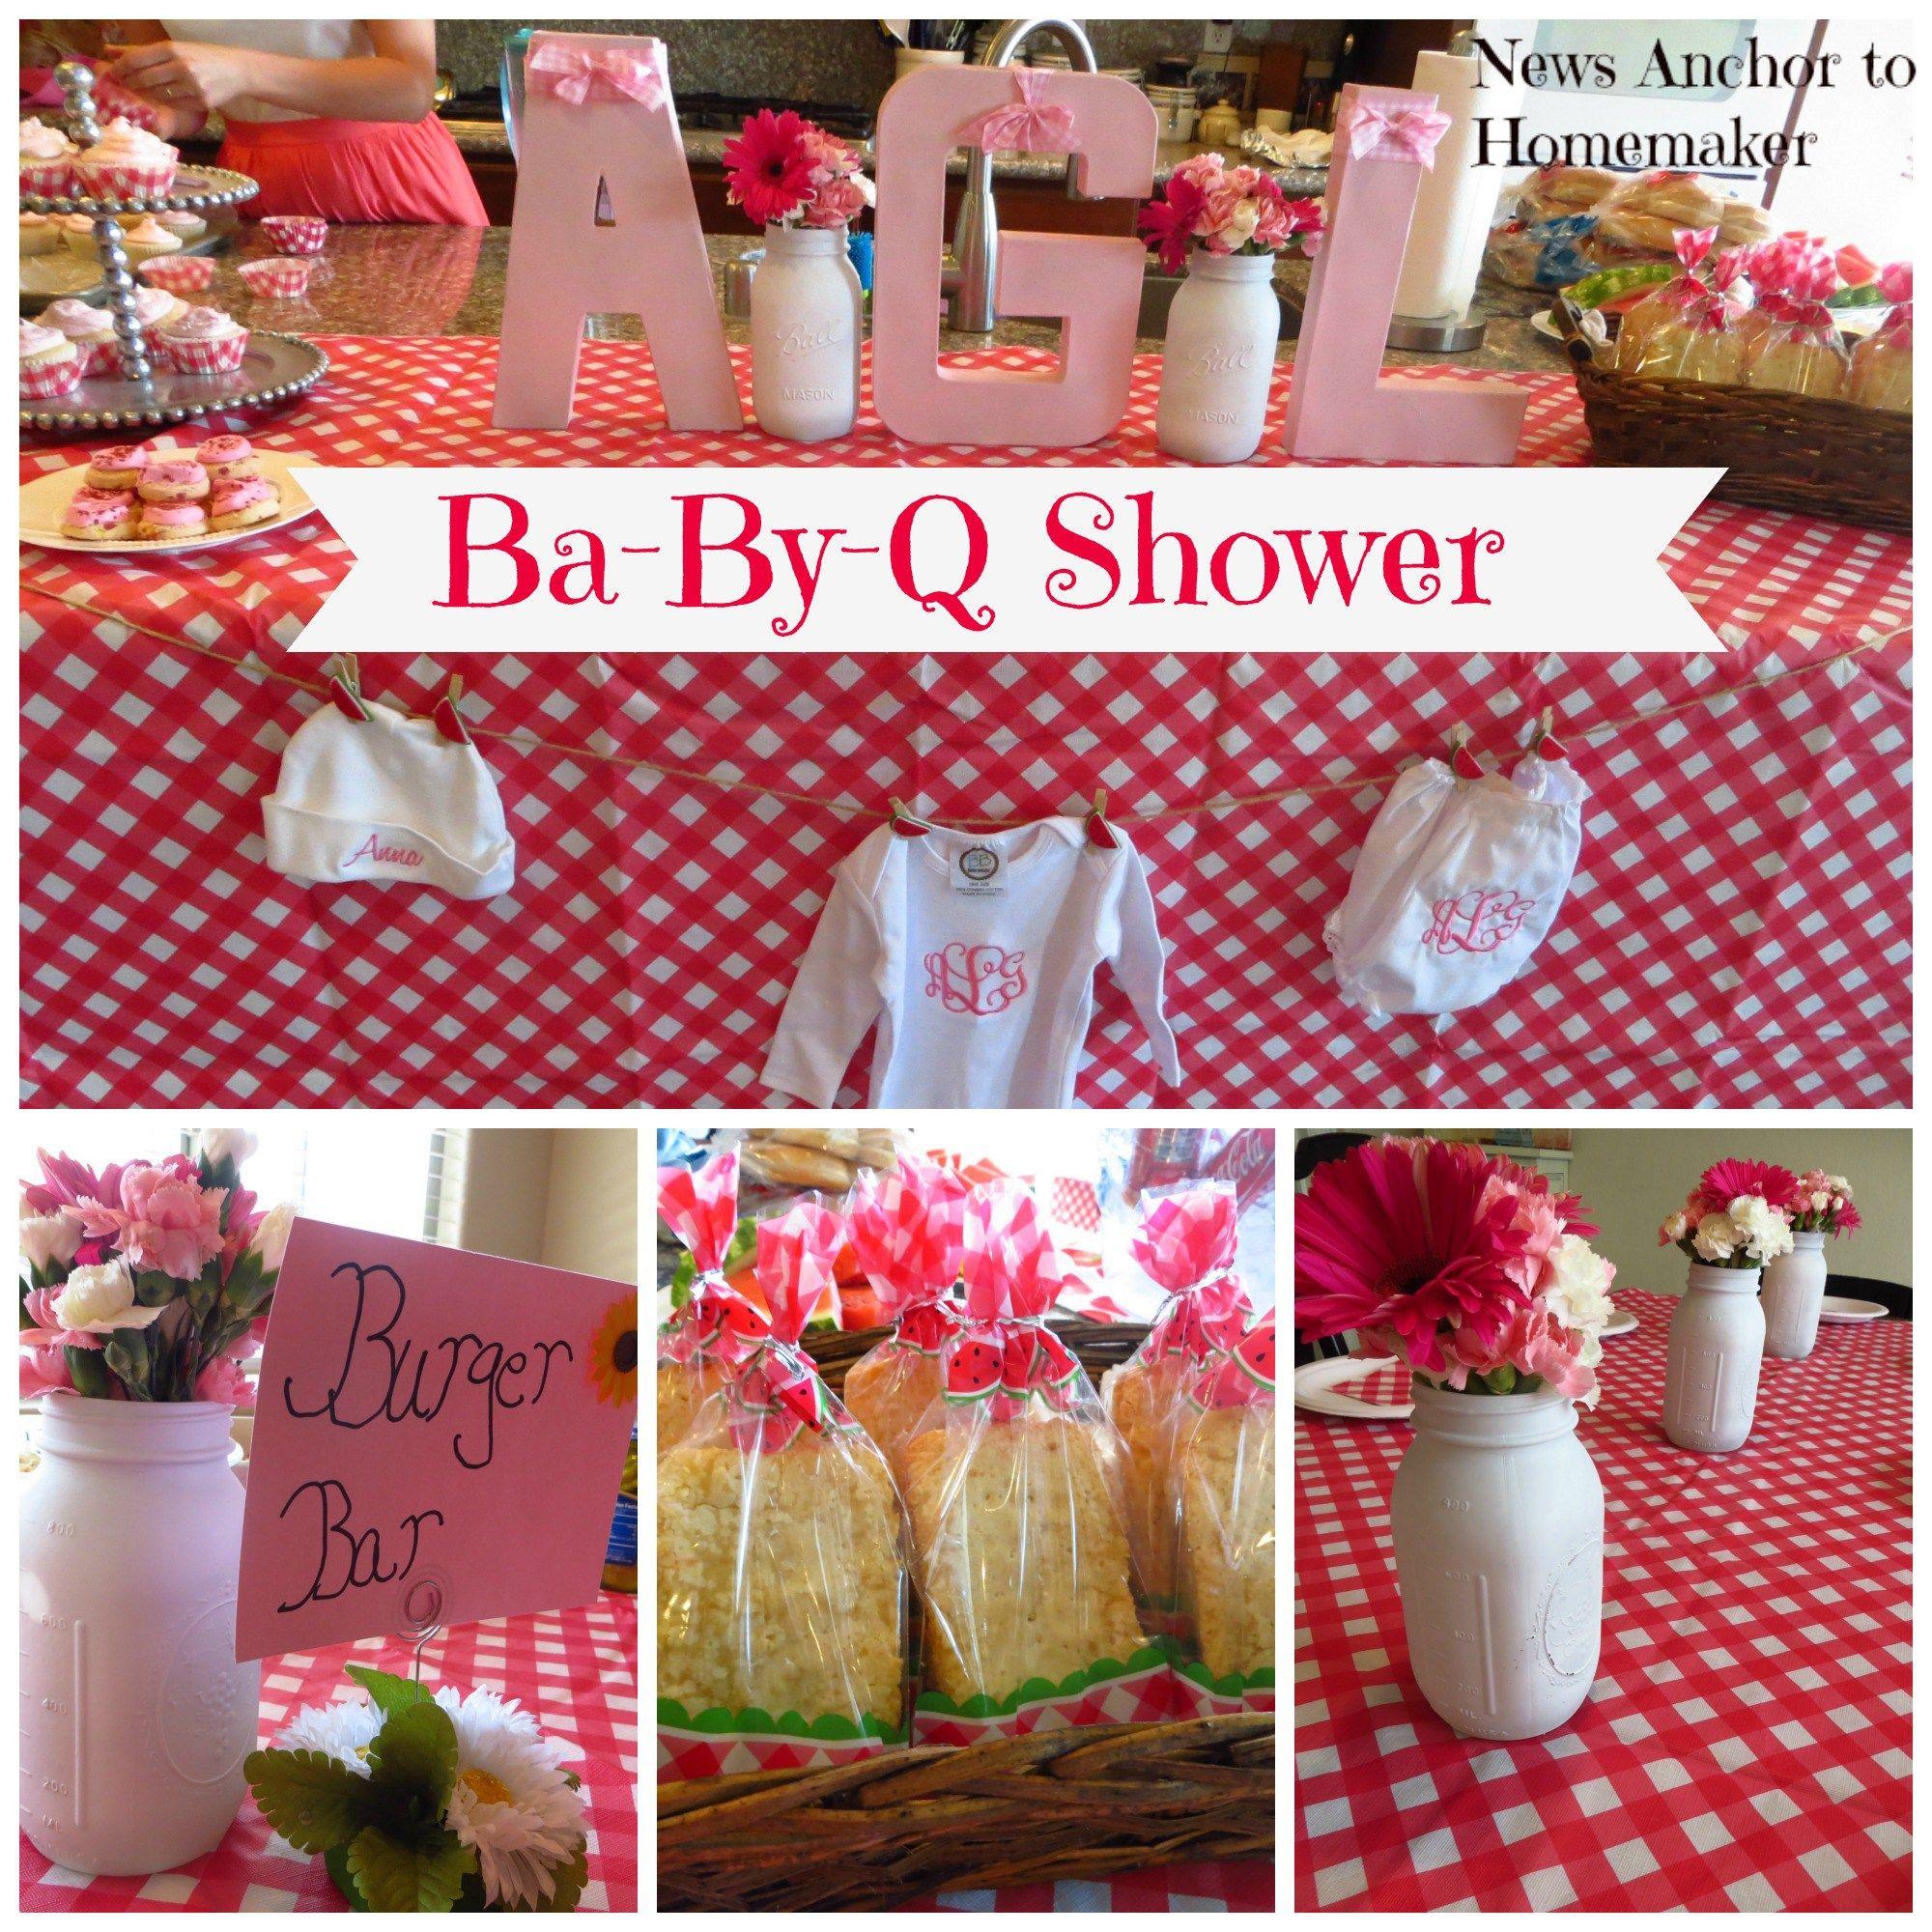 Ba By Q Shower On Newsanchortohomemaker Bbq Baby Shower